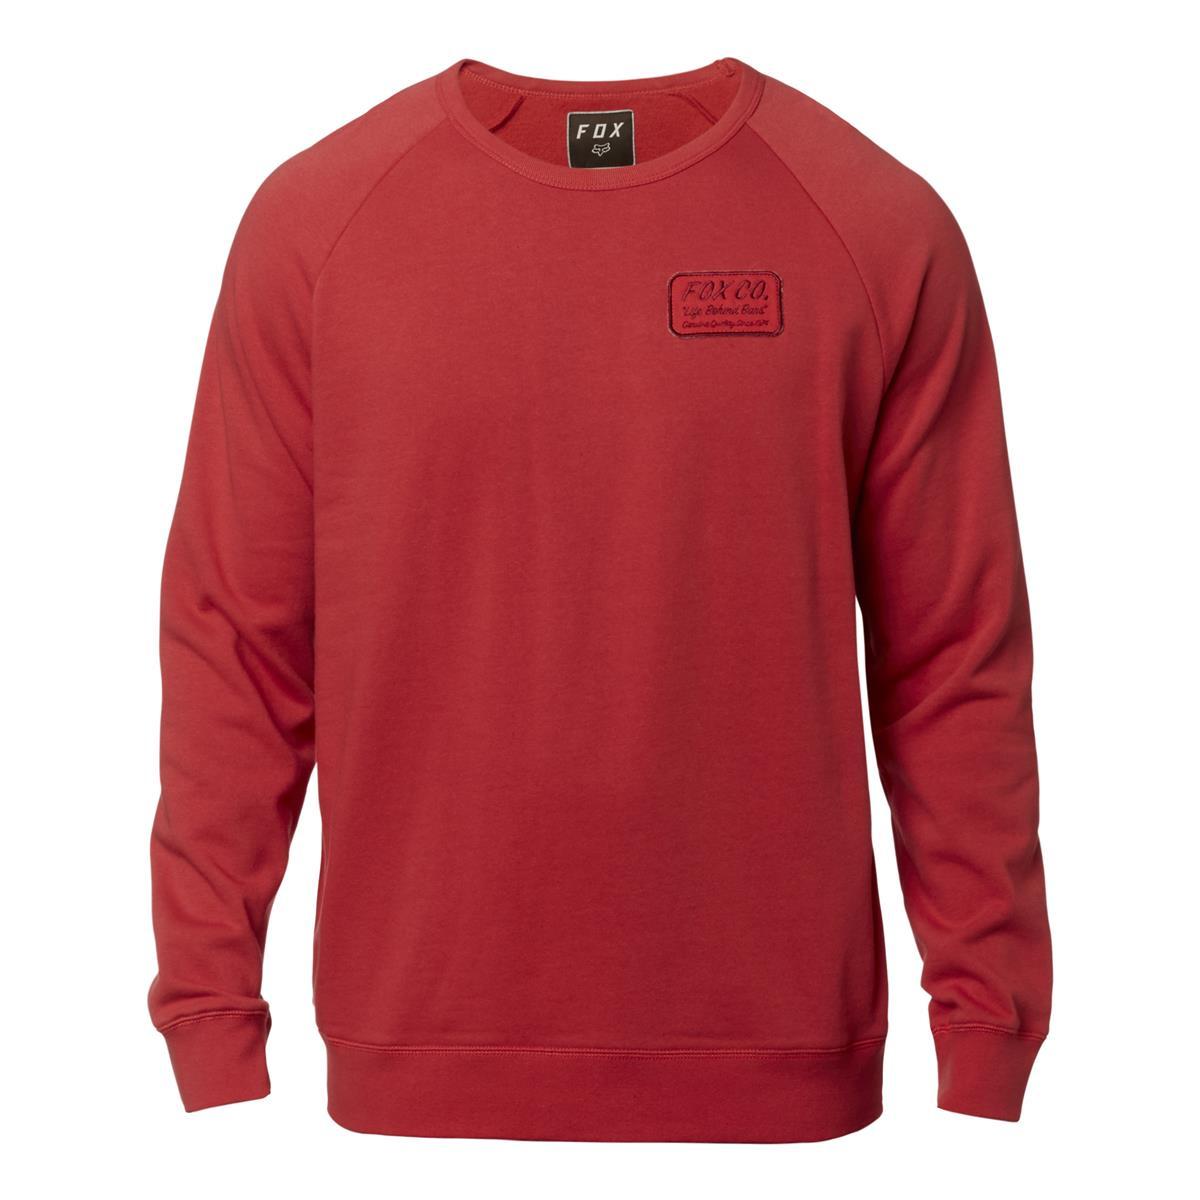 Fox Sweatshirt Resin Crew Rio Red